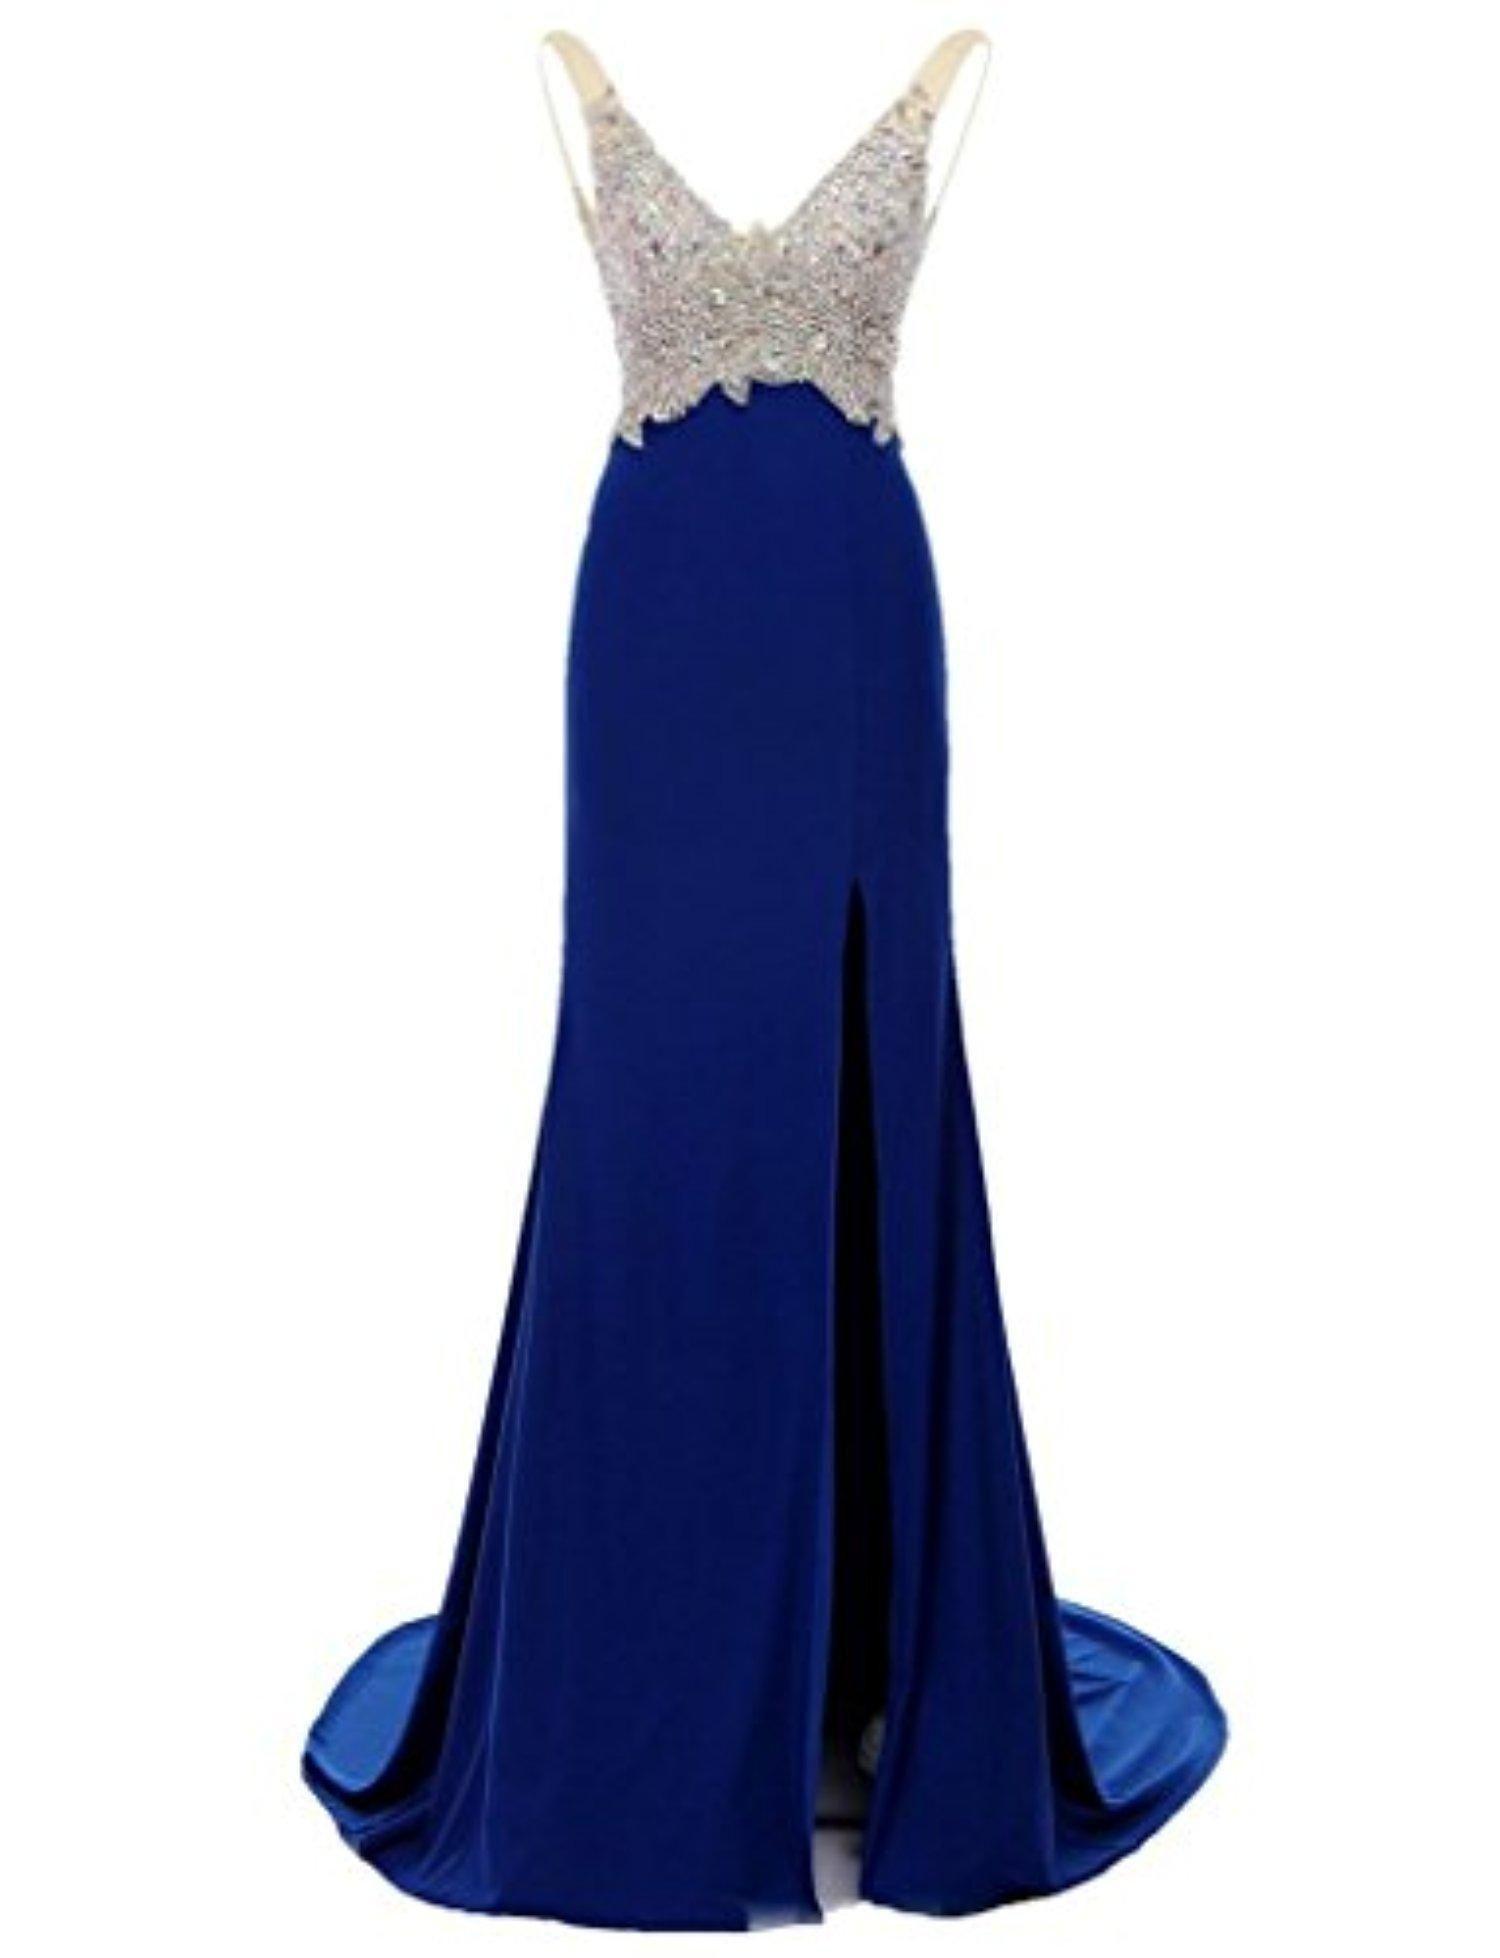 Elinadress mermaid vneck crystal beading long prom dress with slit